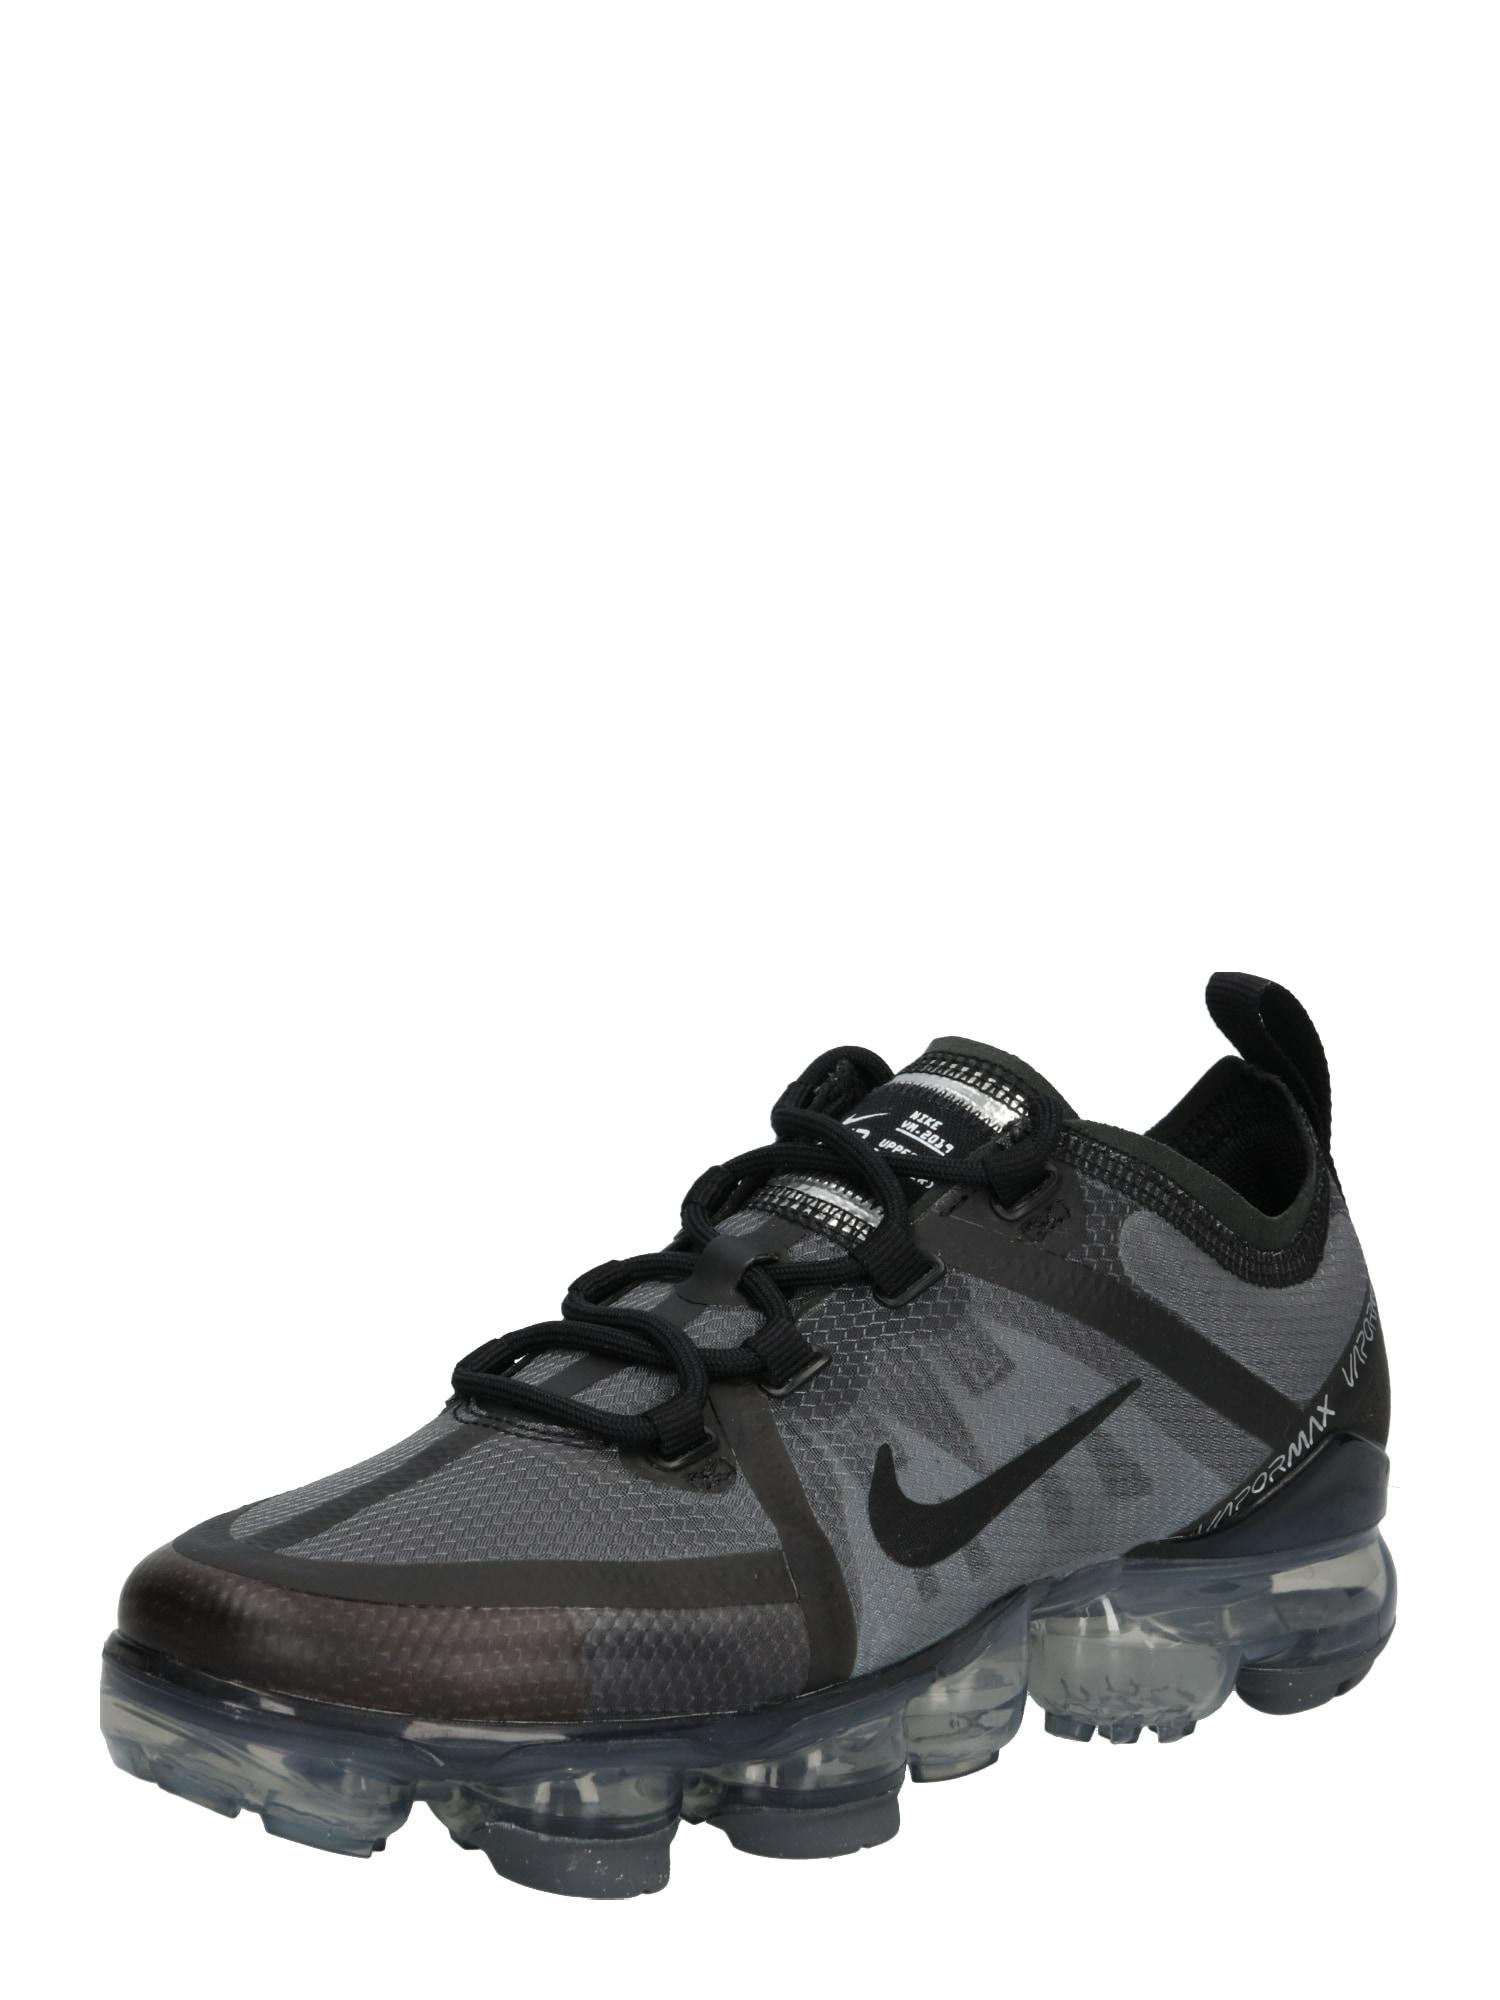 Tenisky Nike Air VaporMax 2019 tmavě šedá černá Nike Sportswear